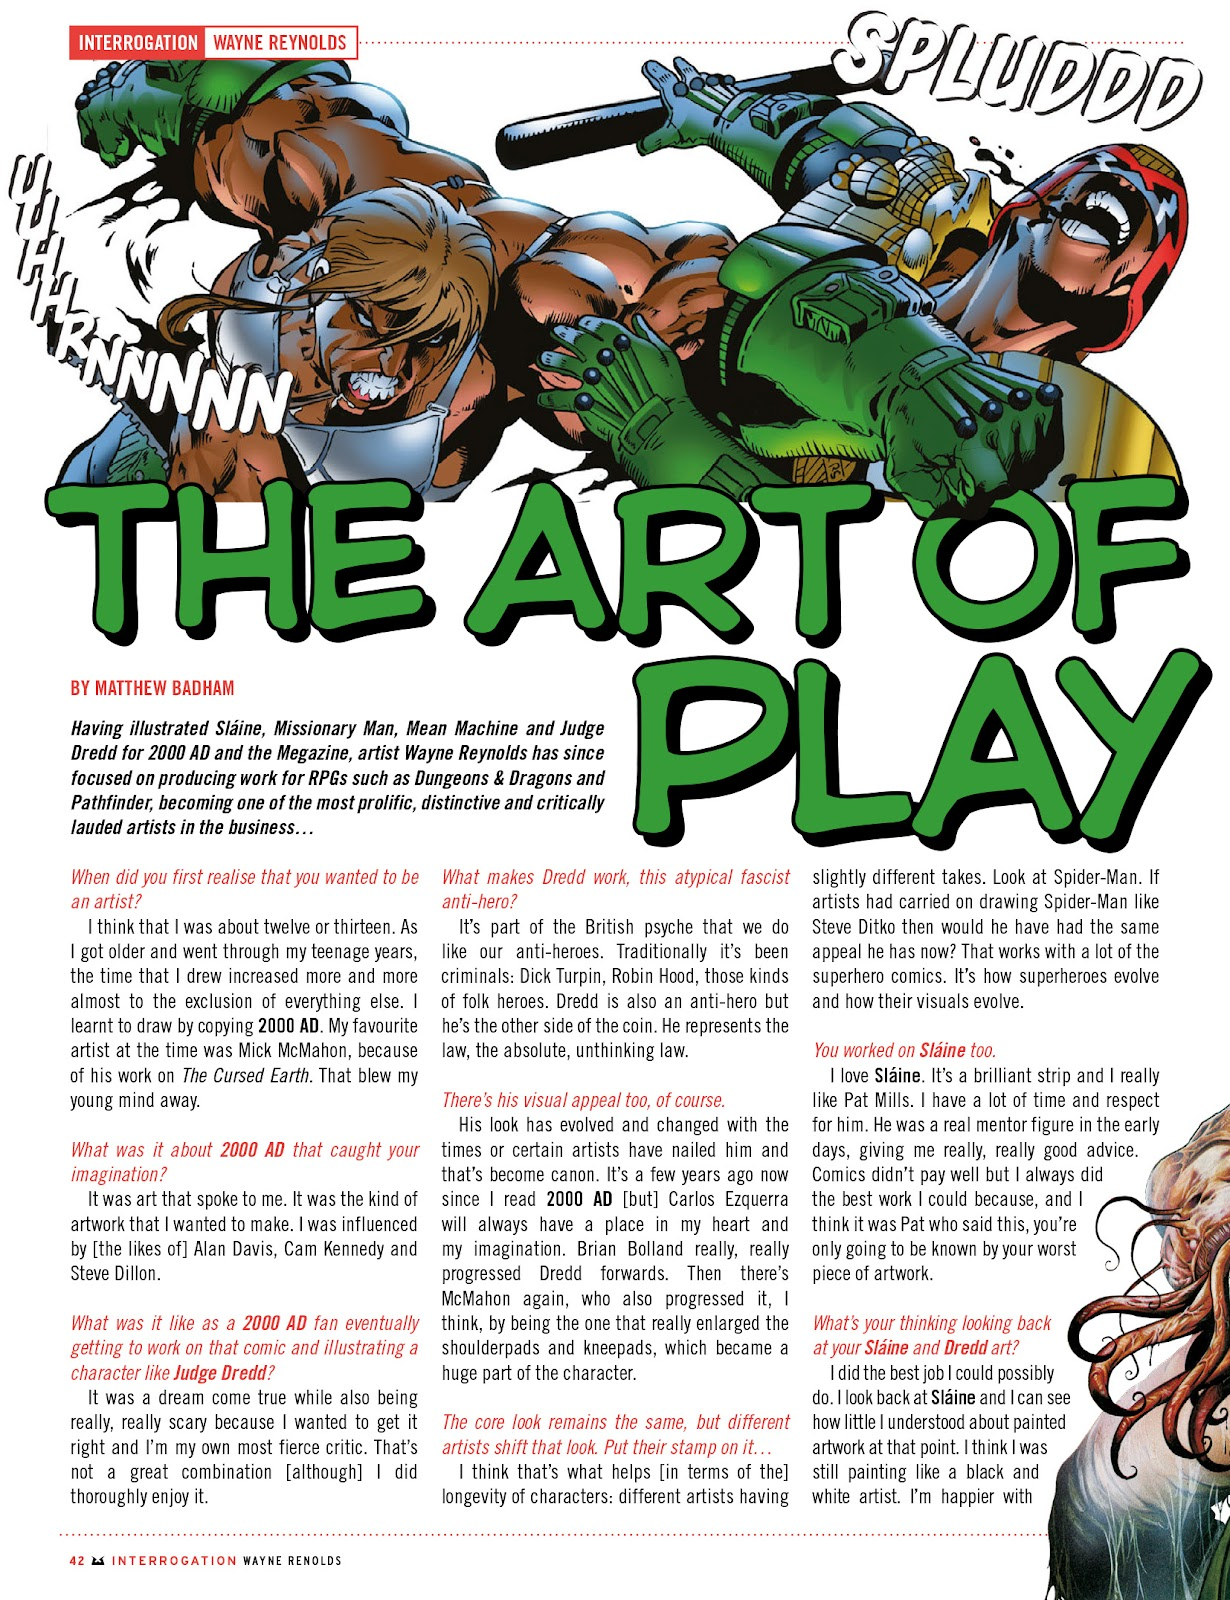 Judge Dredd Megazine (Vol. 5) issue 427 - Page 41